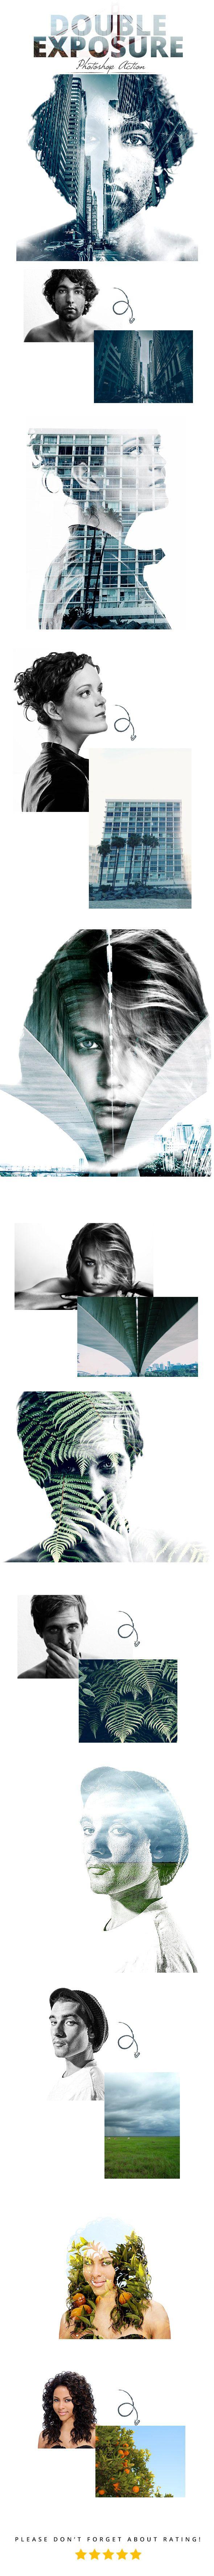 Double Exposure Action - Photo Effects Actions Like & Repin. Noelito Flow. Noel songs. follow my links http://www.instagram.com/noelitoflow